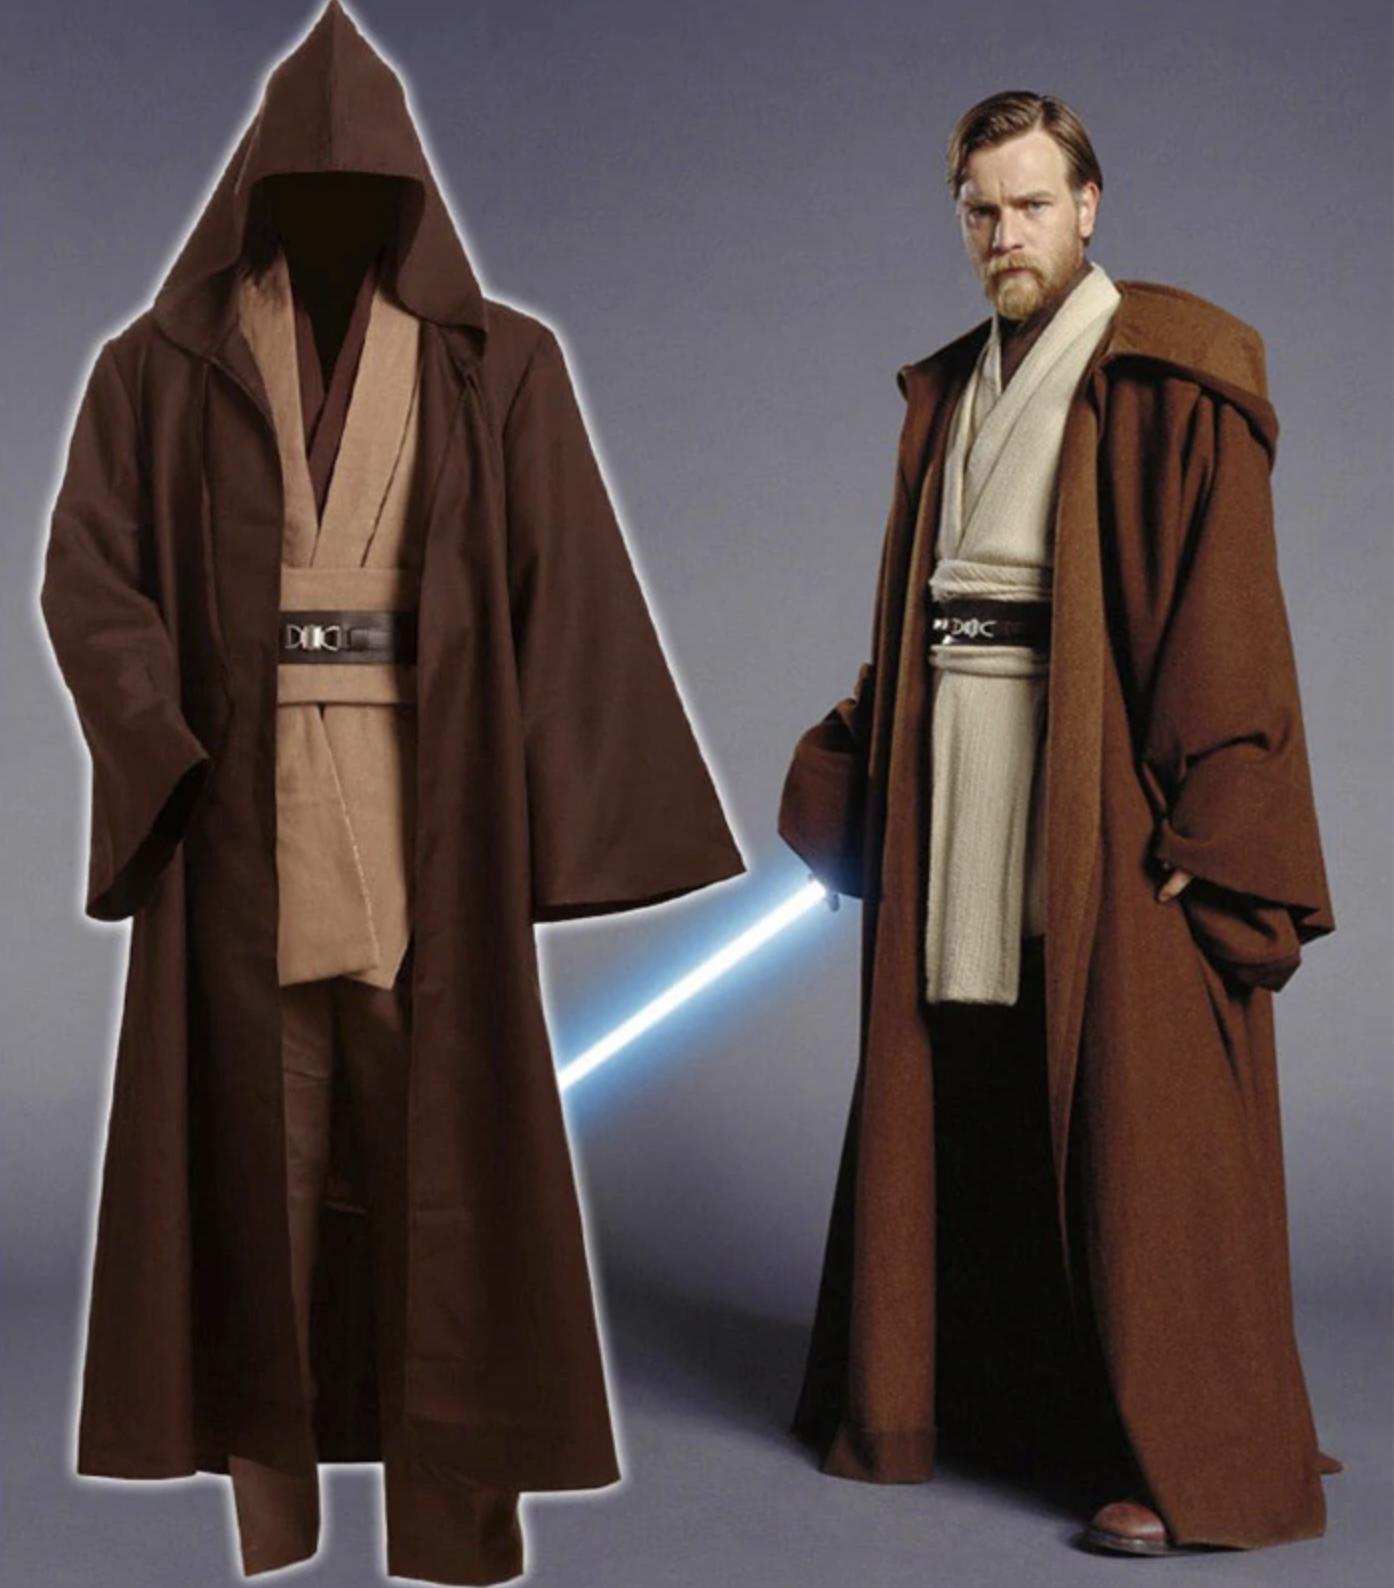 La tunica da cavaliere Jedi di Obi-Wan Kenobi